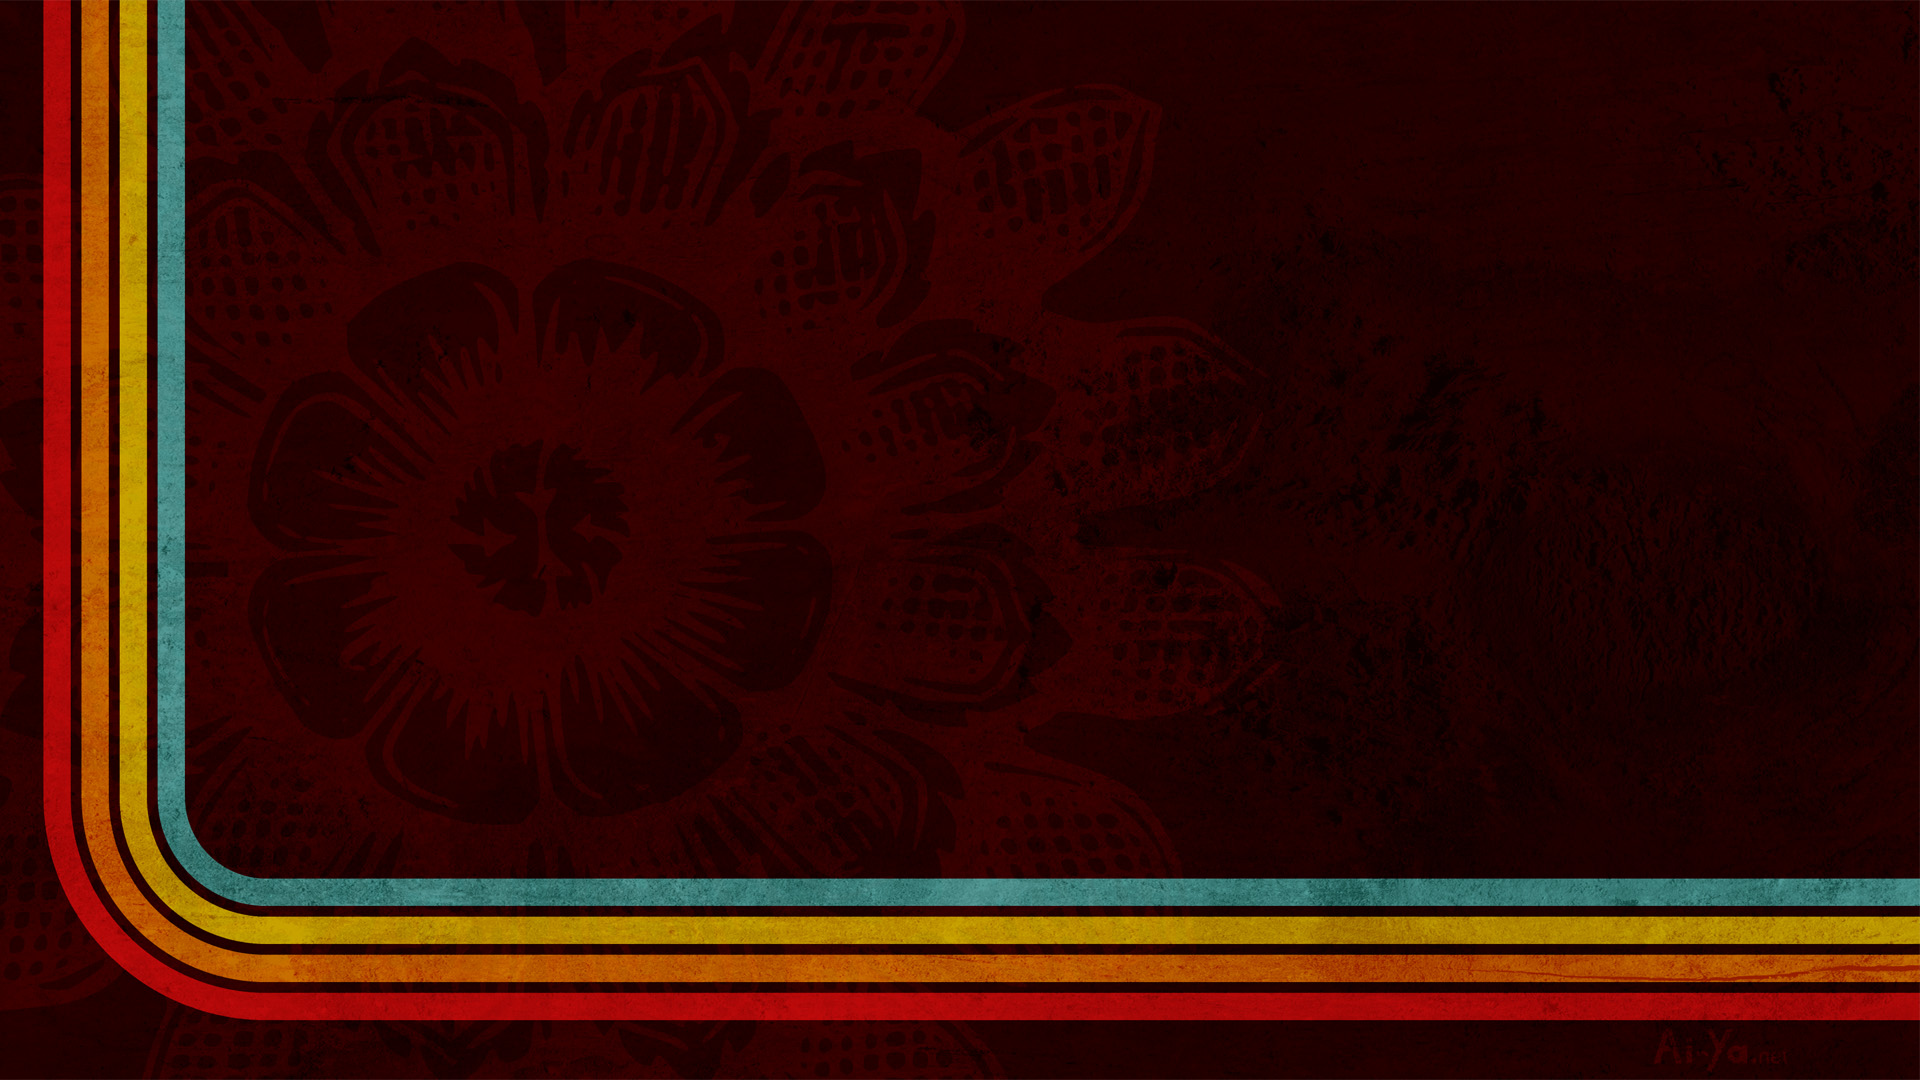 Aesthetic Desktop Wallpaper Retro - HD Wallpaper